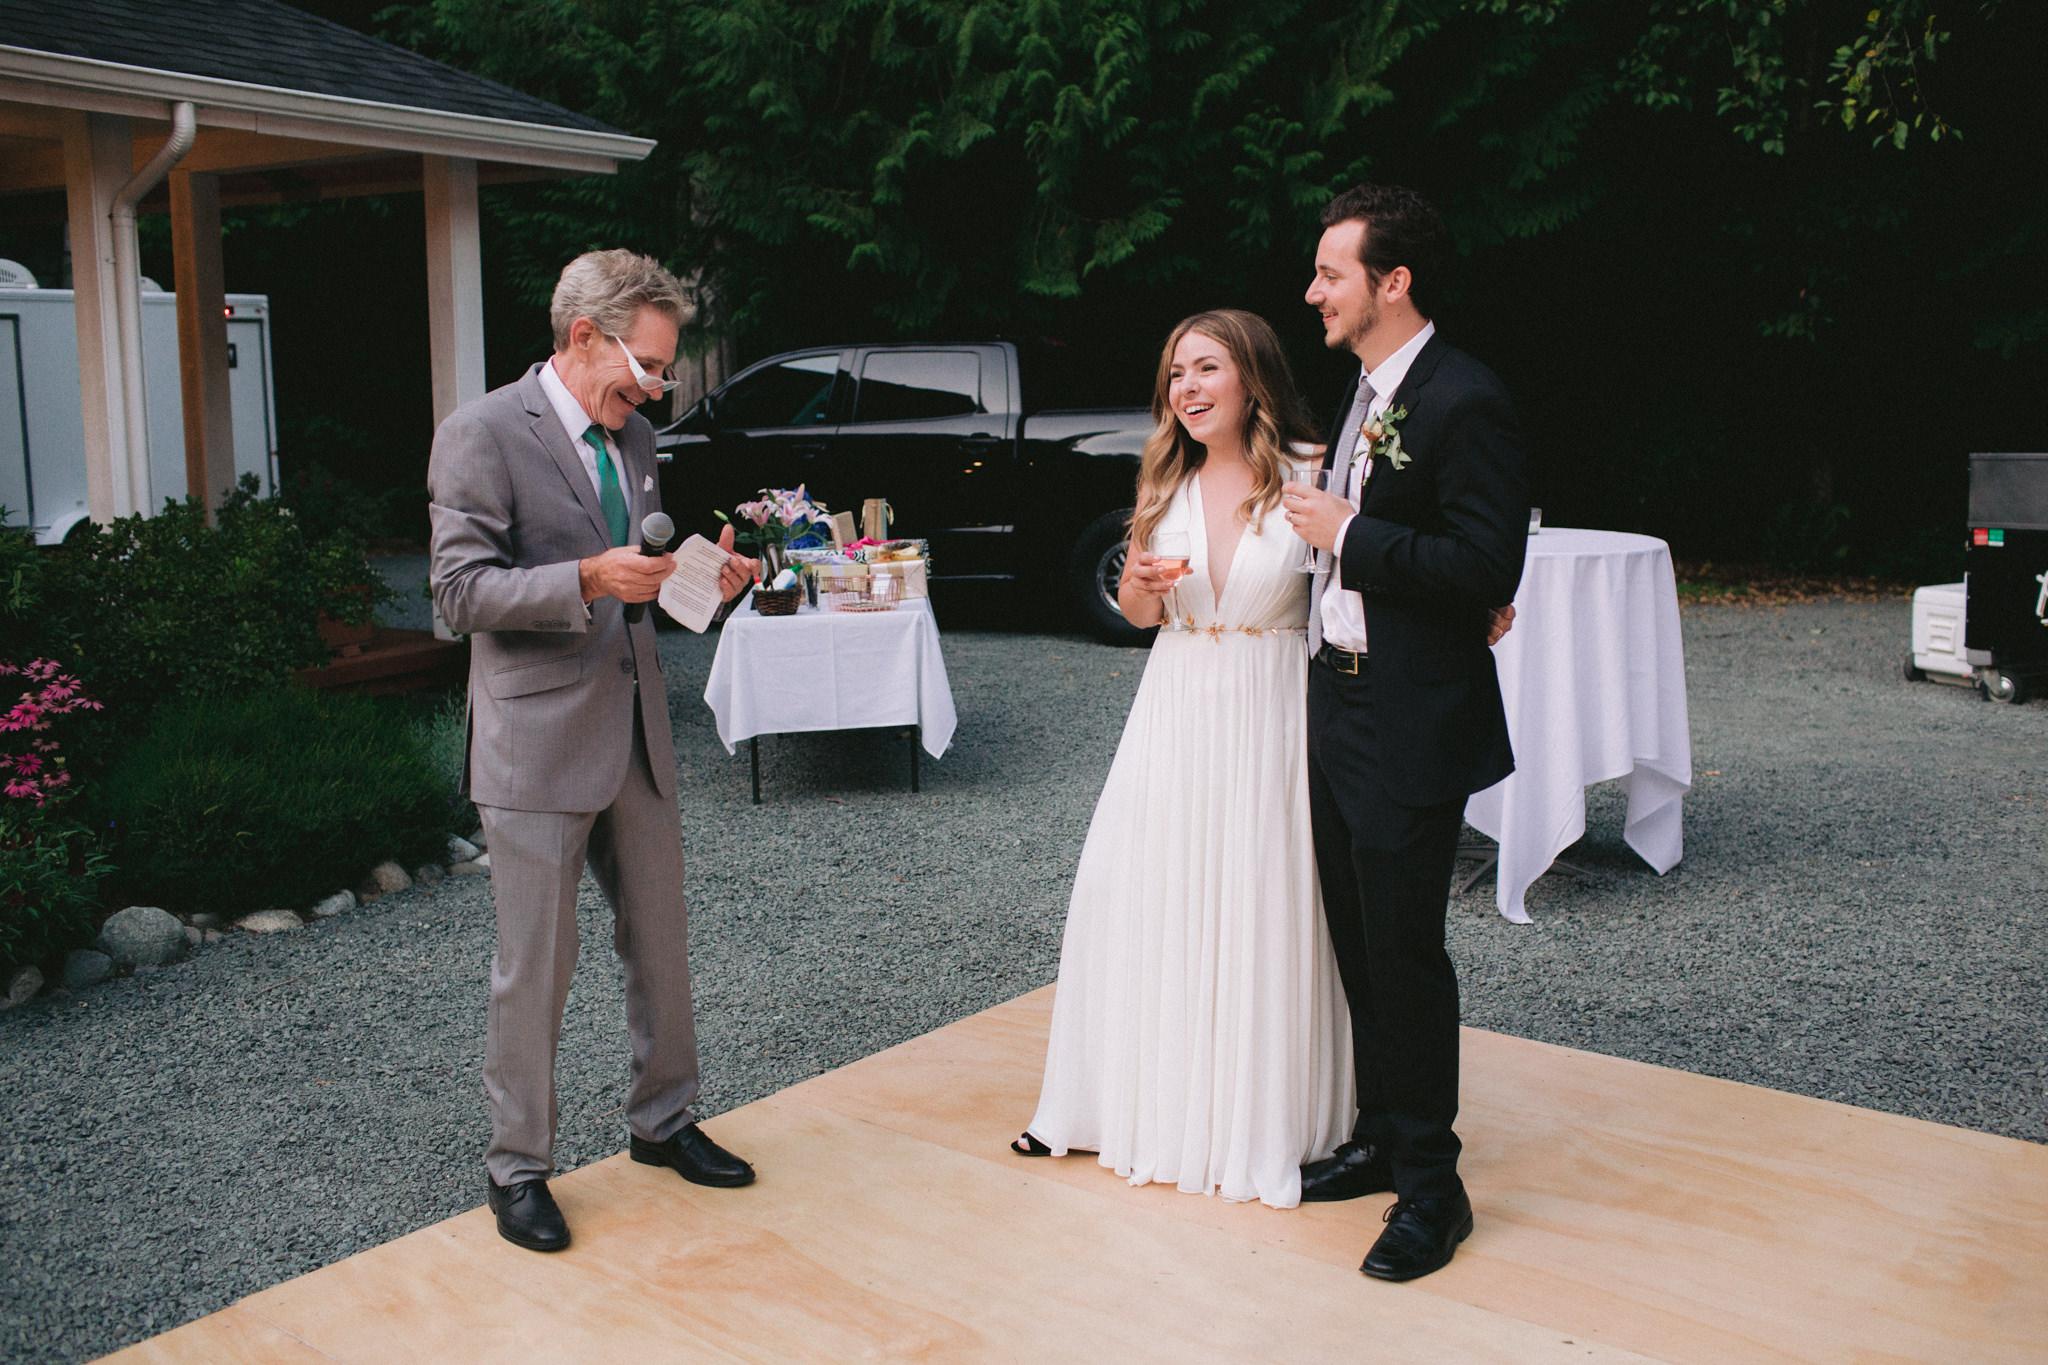 Backyard-Bainbridge-Island-Wedding-Alycia-Lovell-Photography-204.JPG